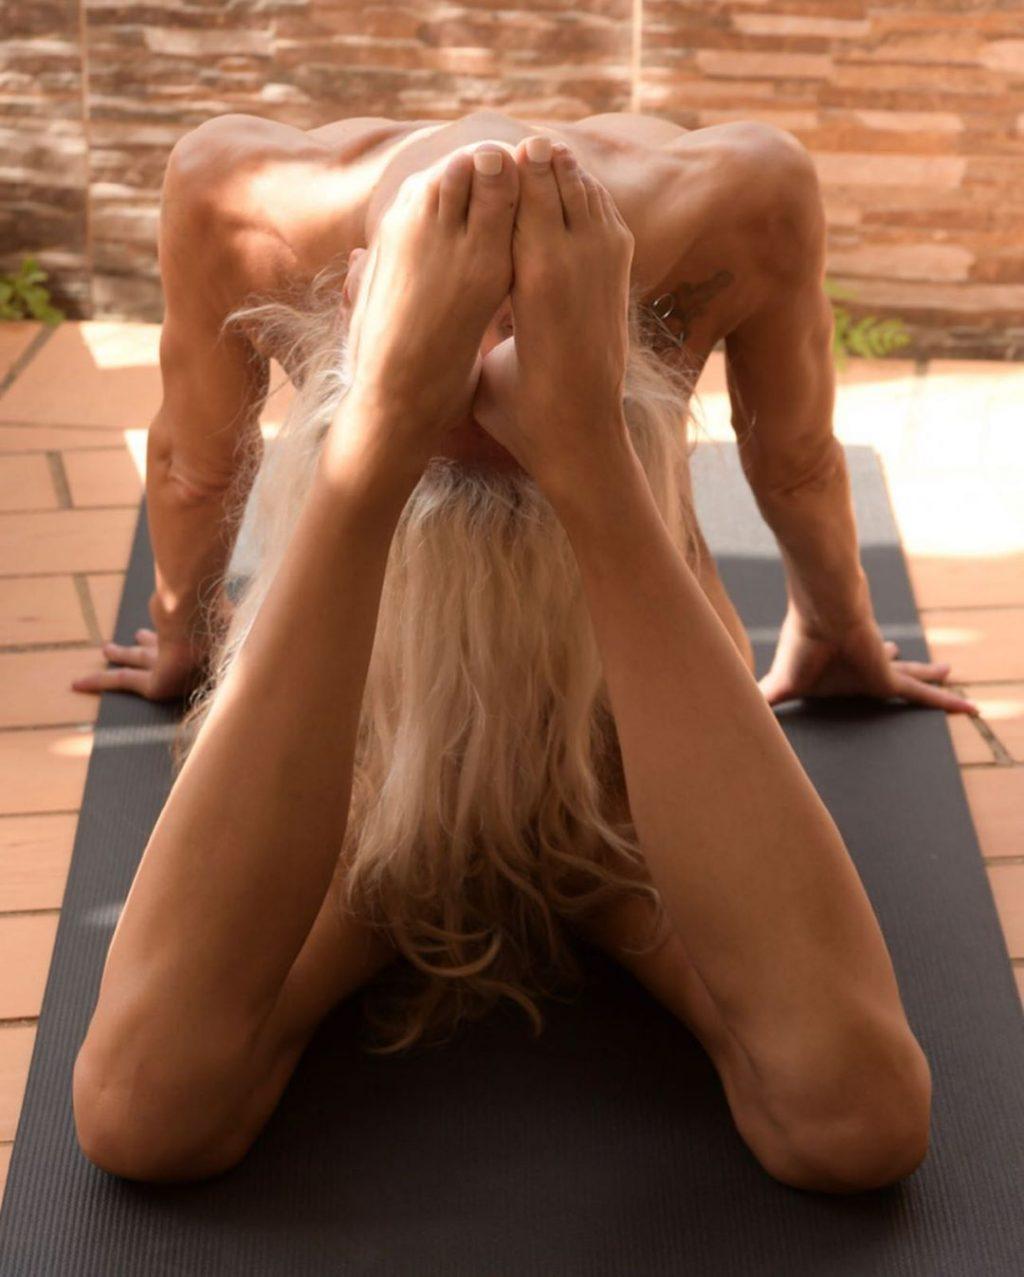 Yoga Flocke Nude & Sexy 036